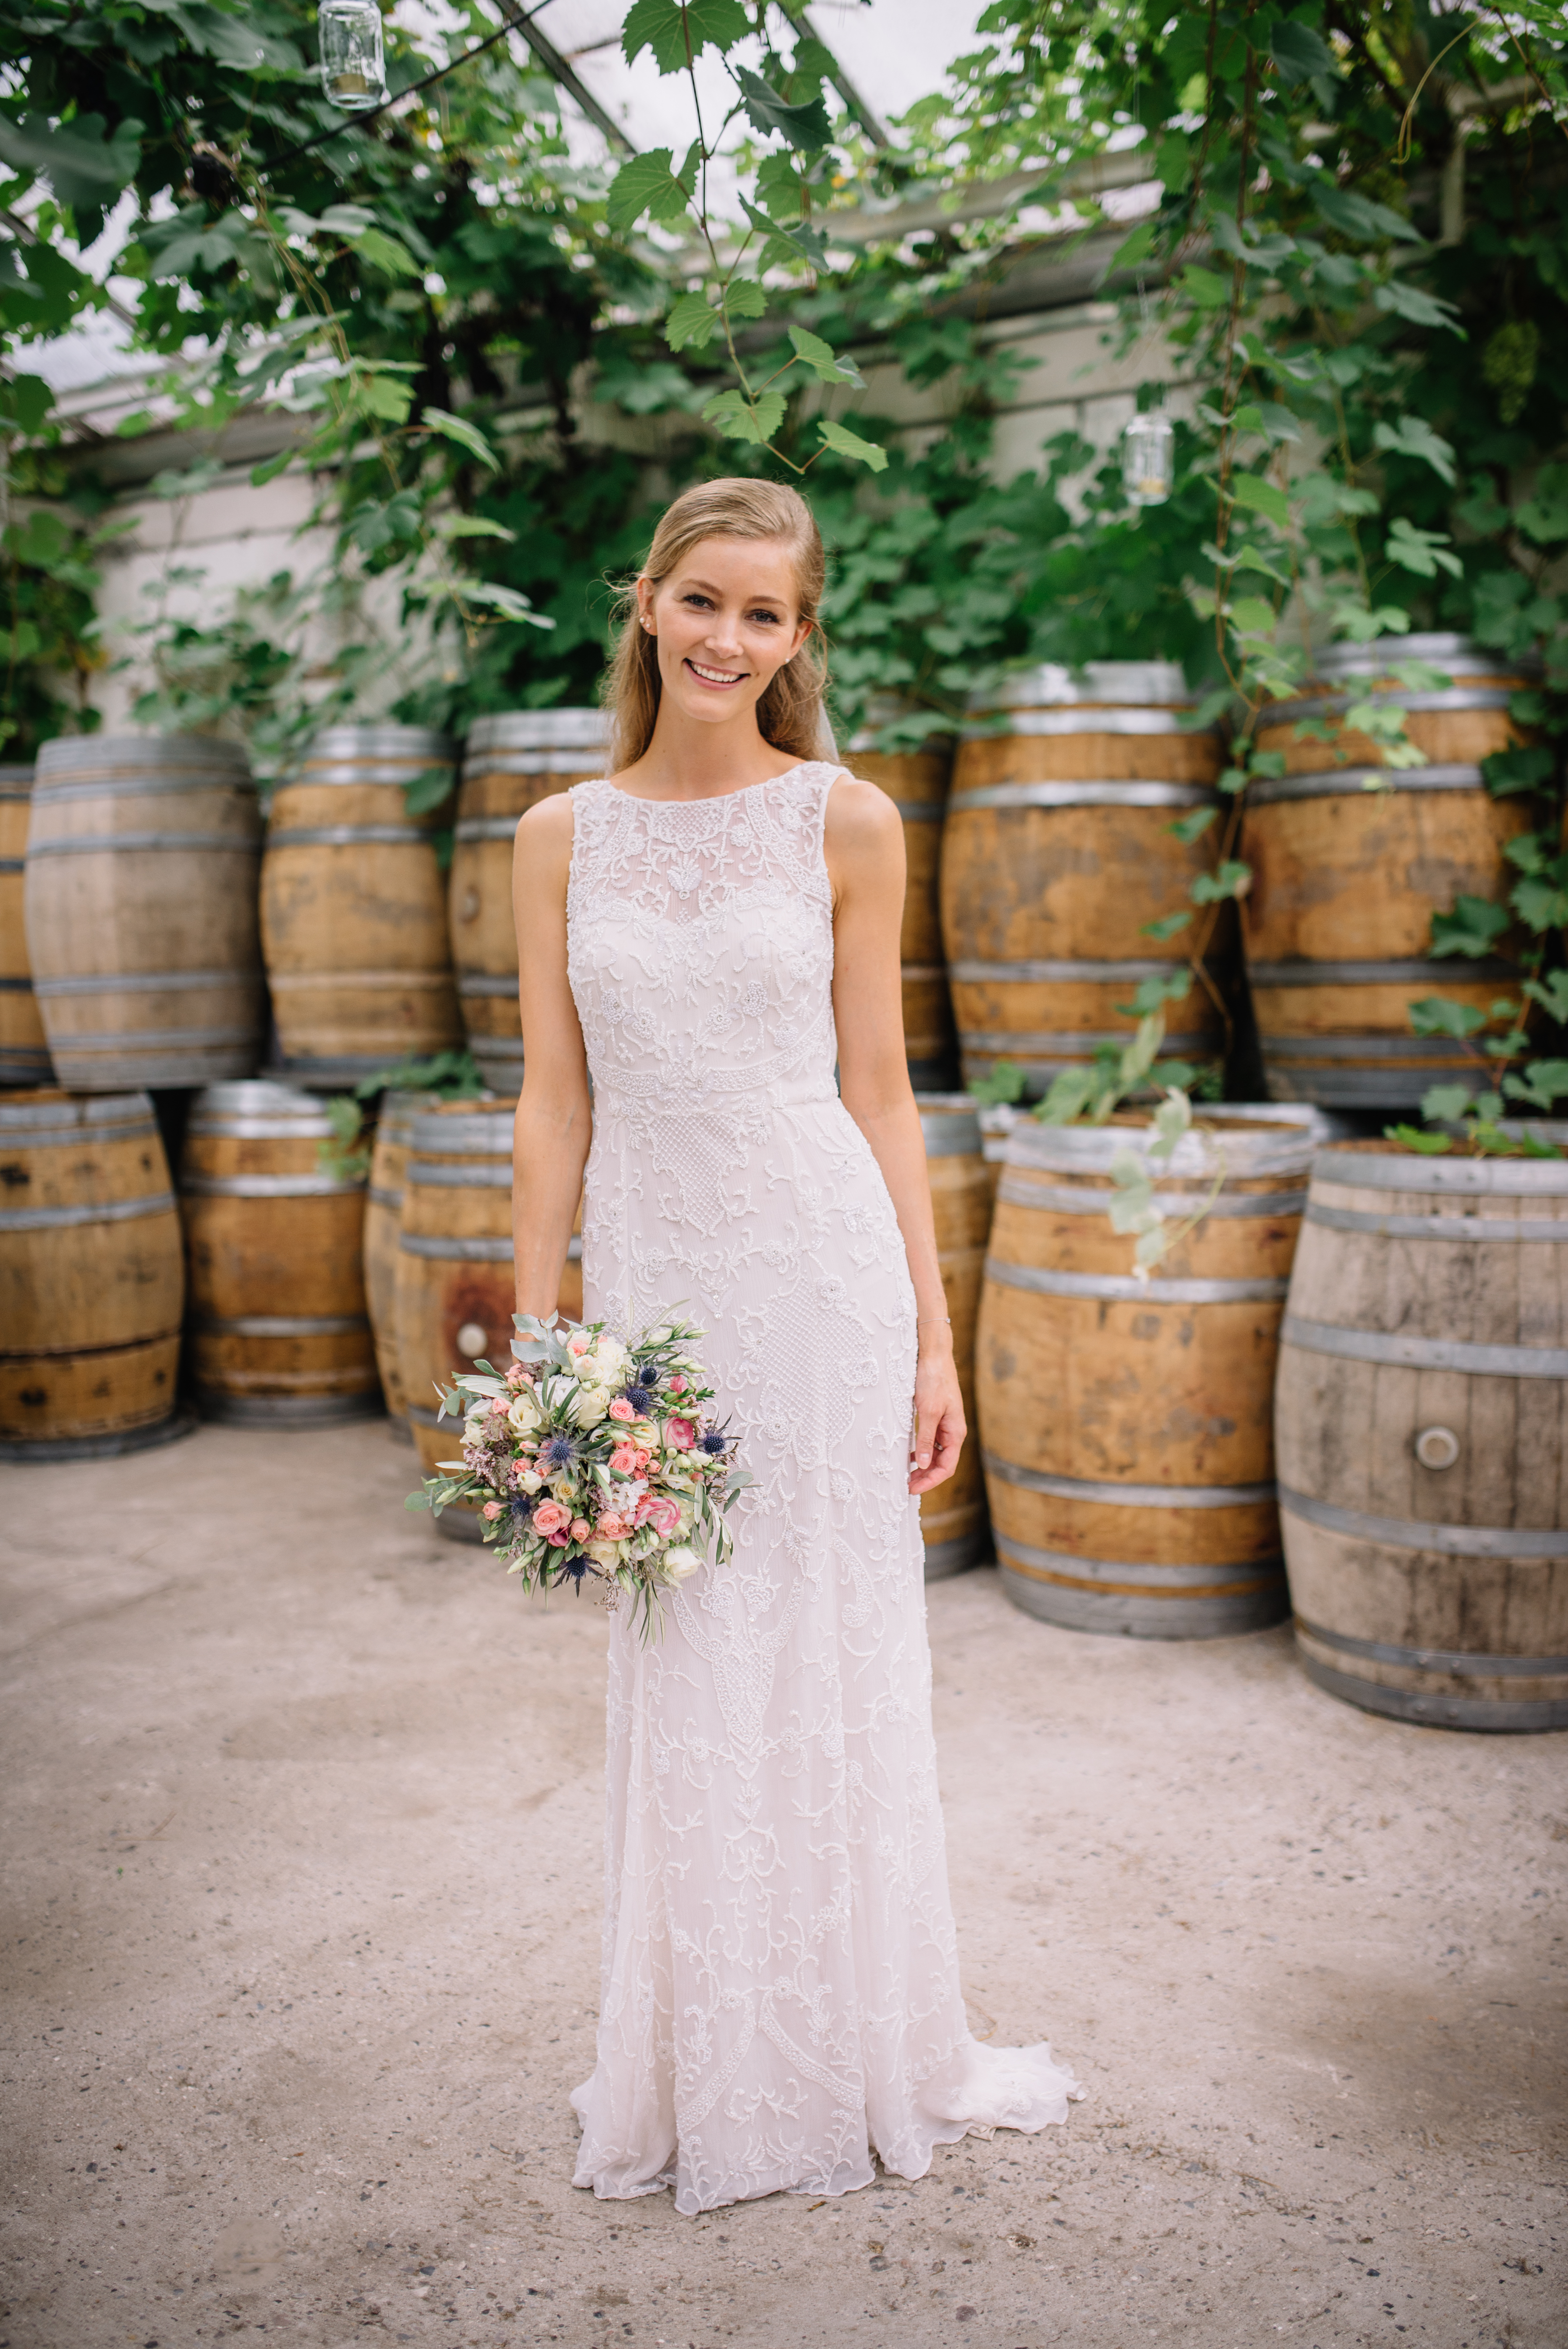 697d2fdf Vores bryllup - Christina Dueholm